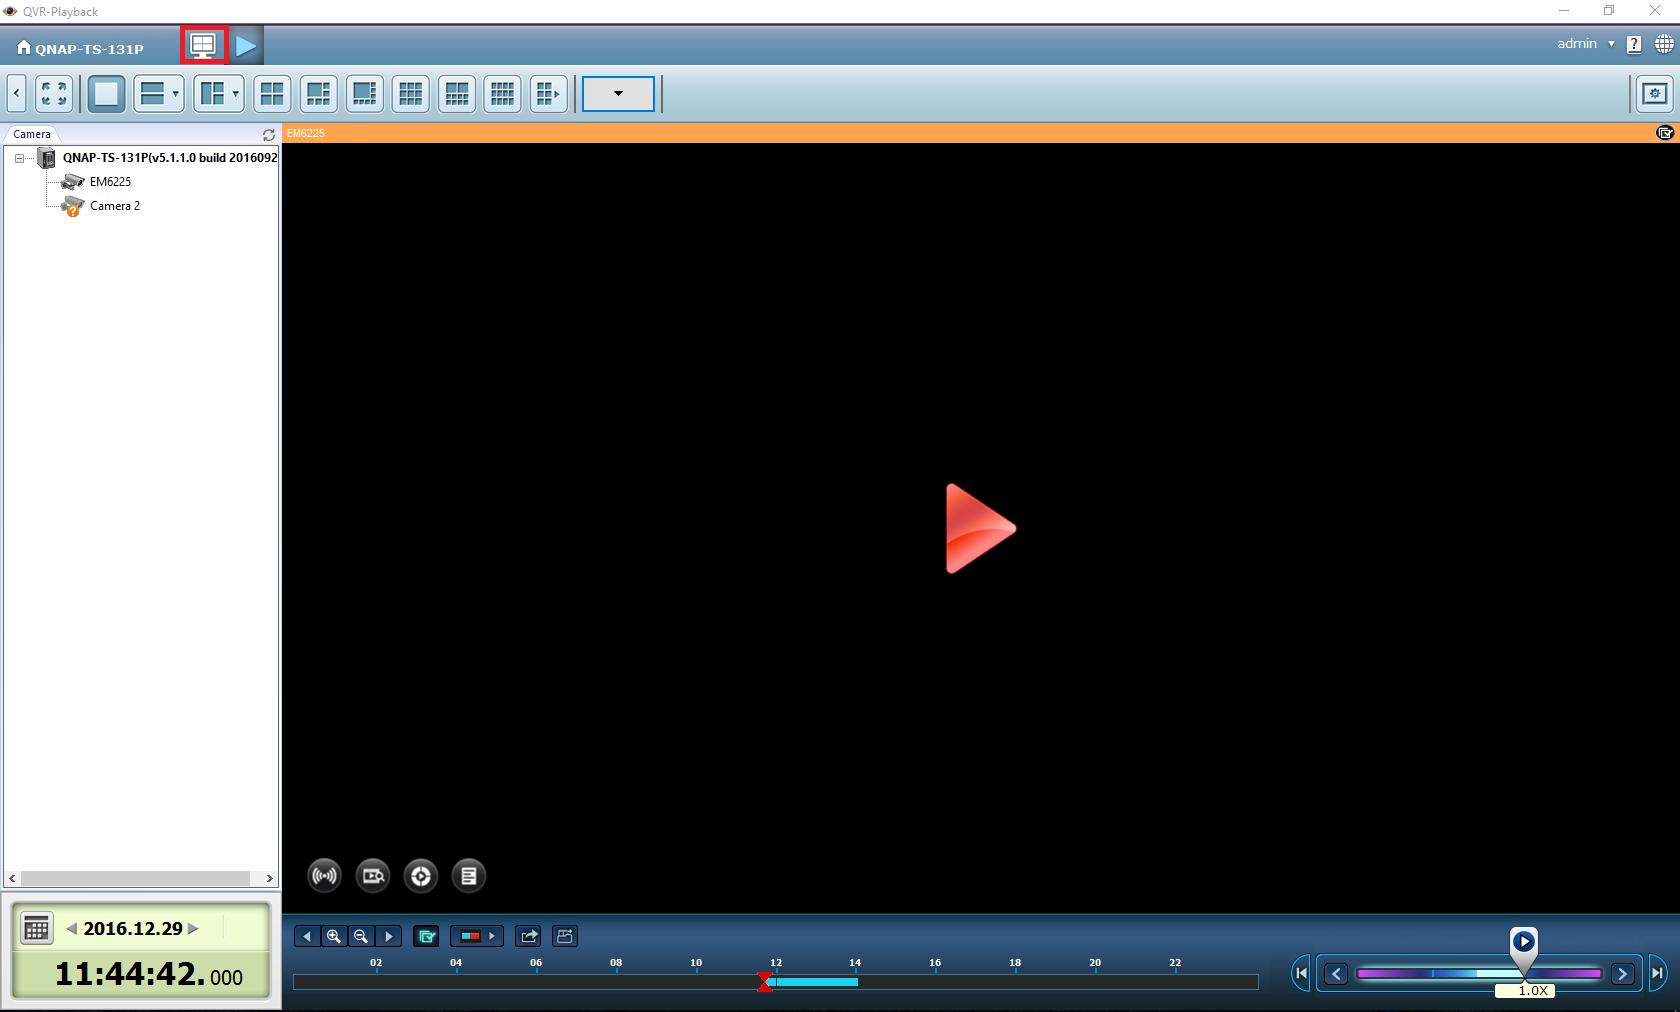 EM63XX_NAS_QNAP_live_bekijken_livestream_UK.png